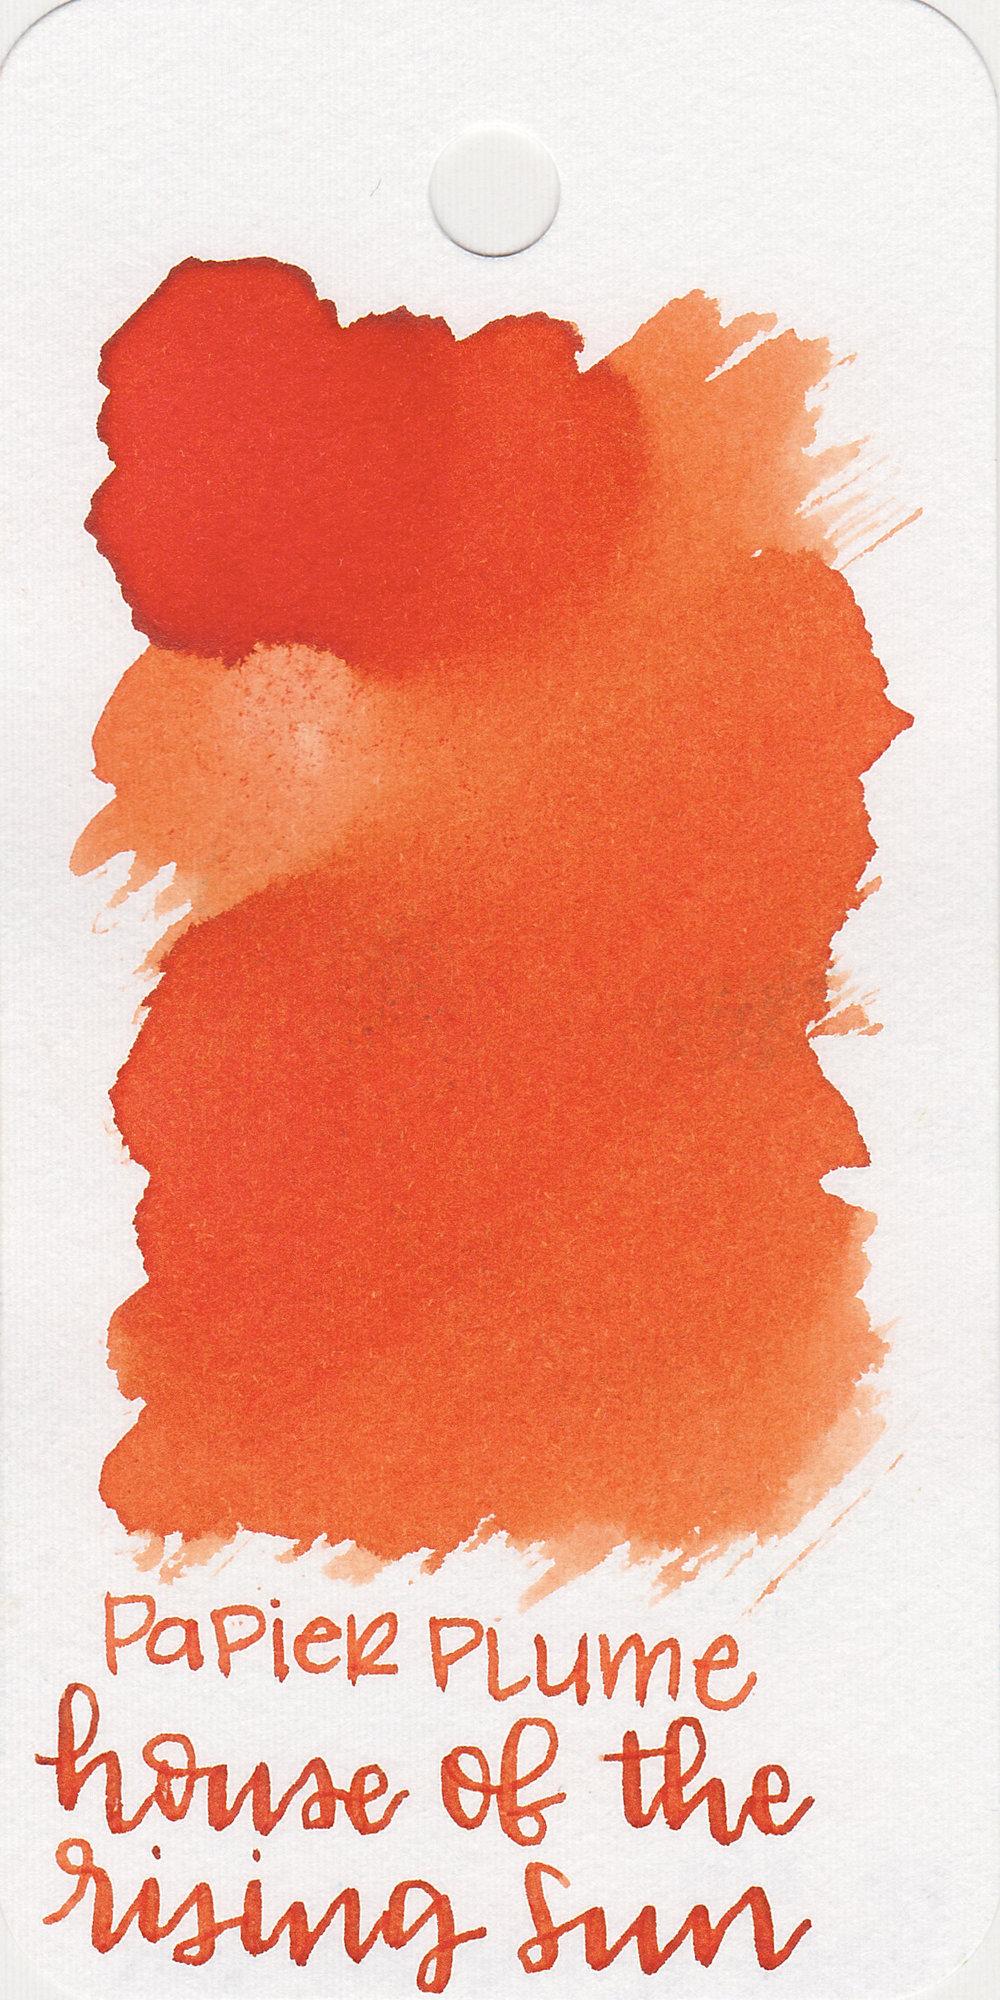 pp-rising-sun-1.jpg